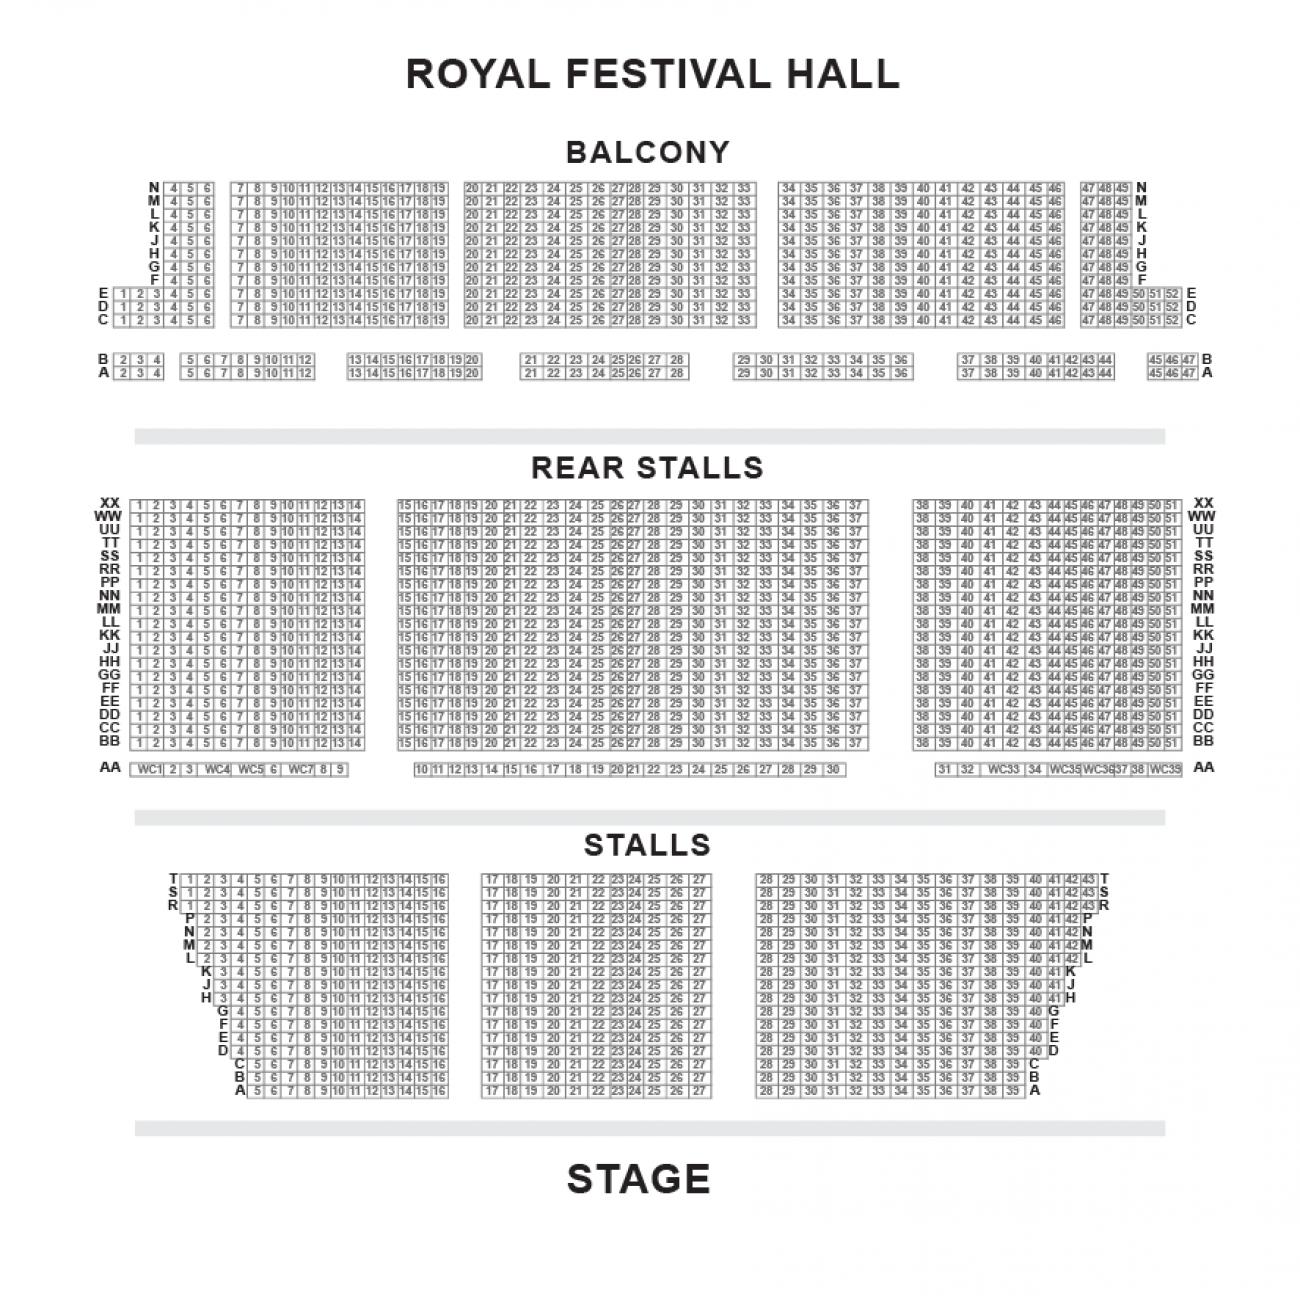 Royal Festival Hall Seating plan